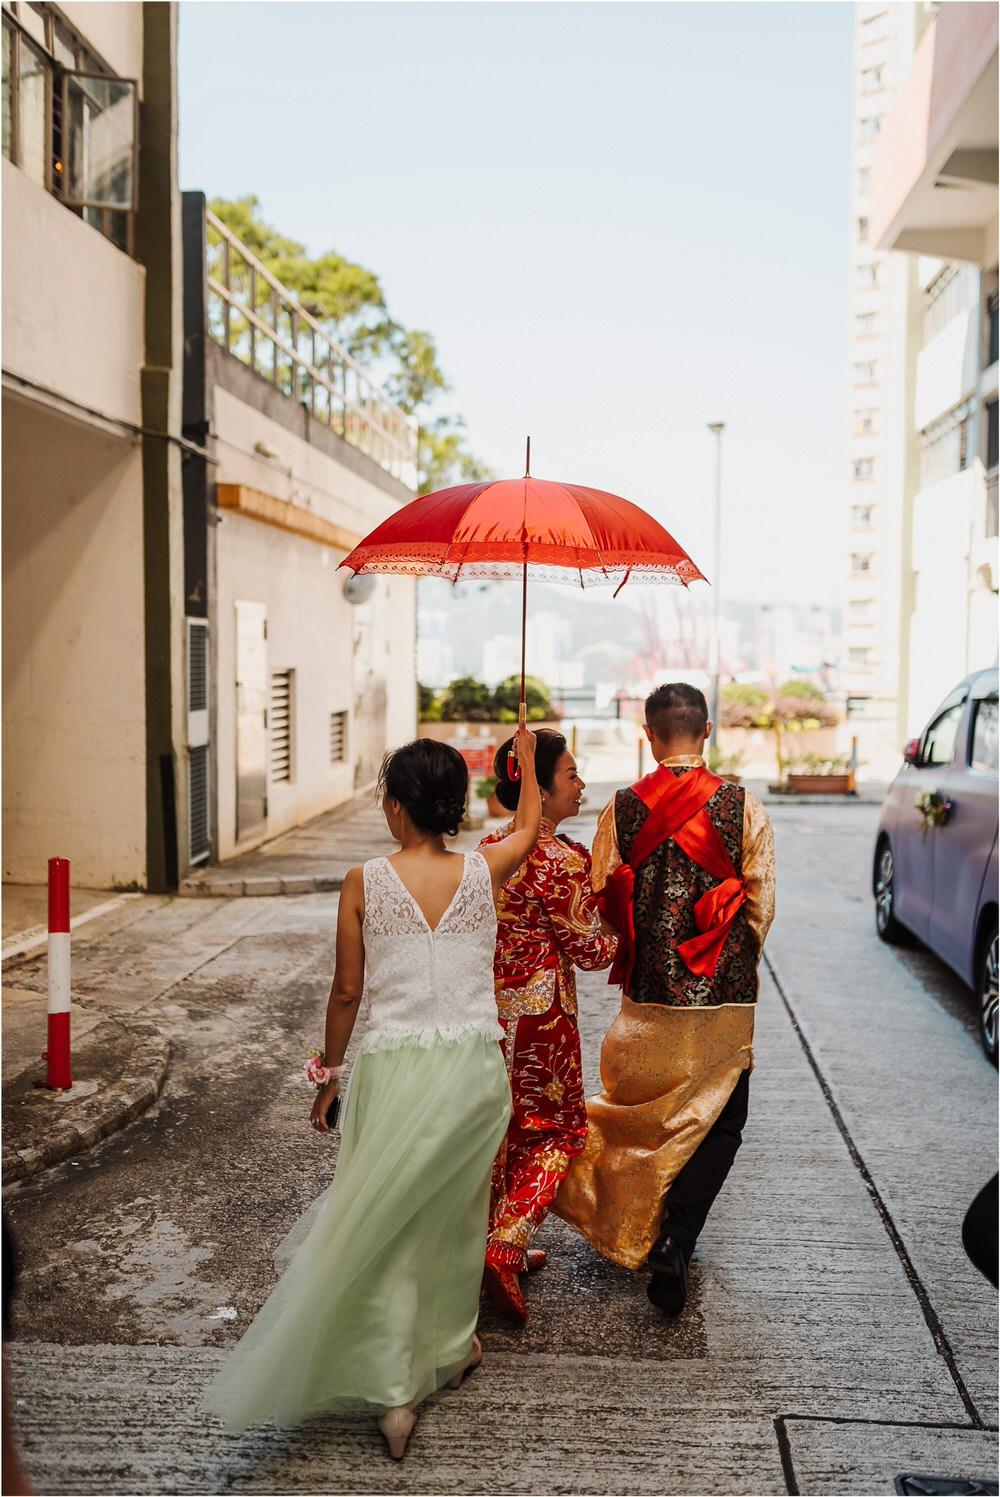 hong kong wedding photographer intercontinental kowloon chinese tea ceremony traditional wedding photography 0046.jpg